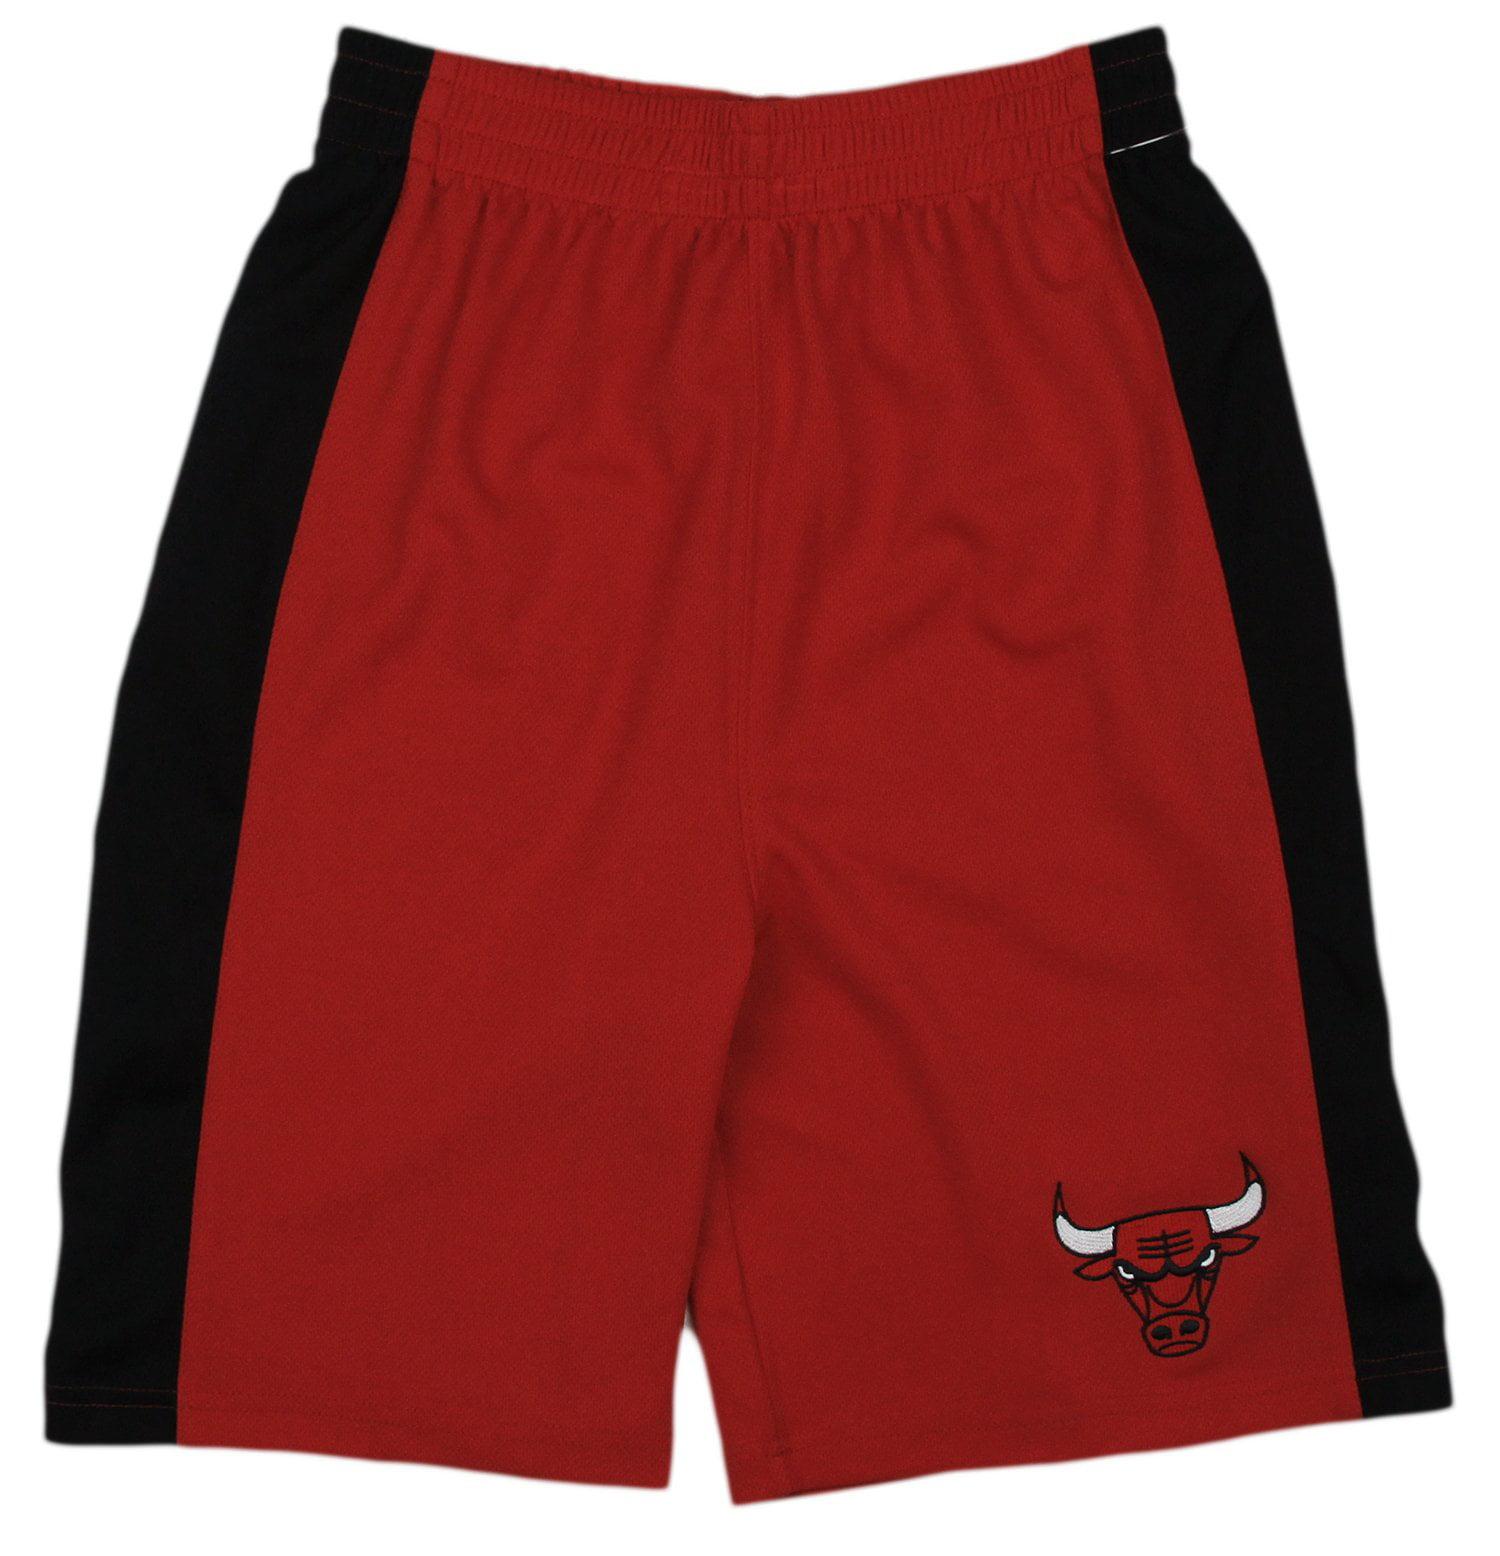 NBA Basketball Kids / Youth Chicago Bulls Team Shorts - Red